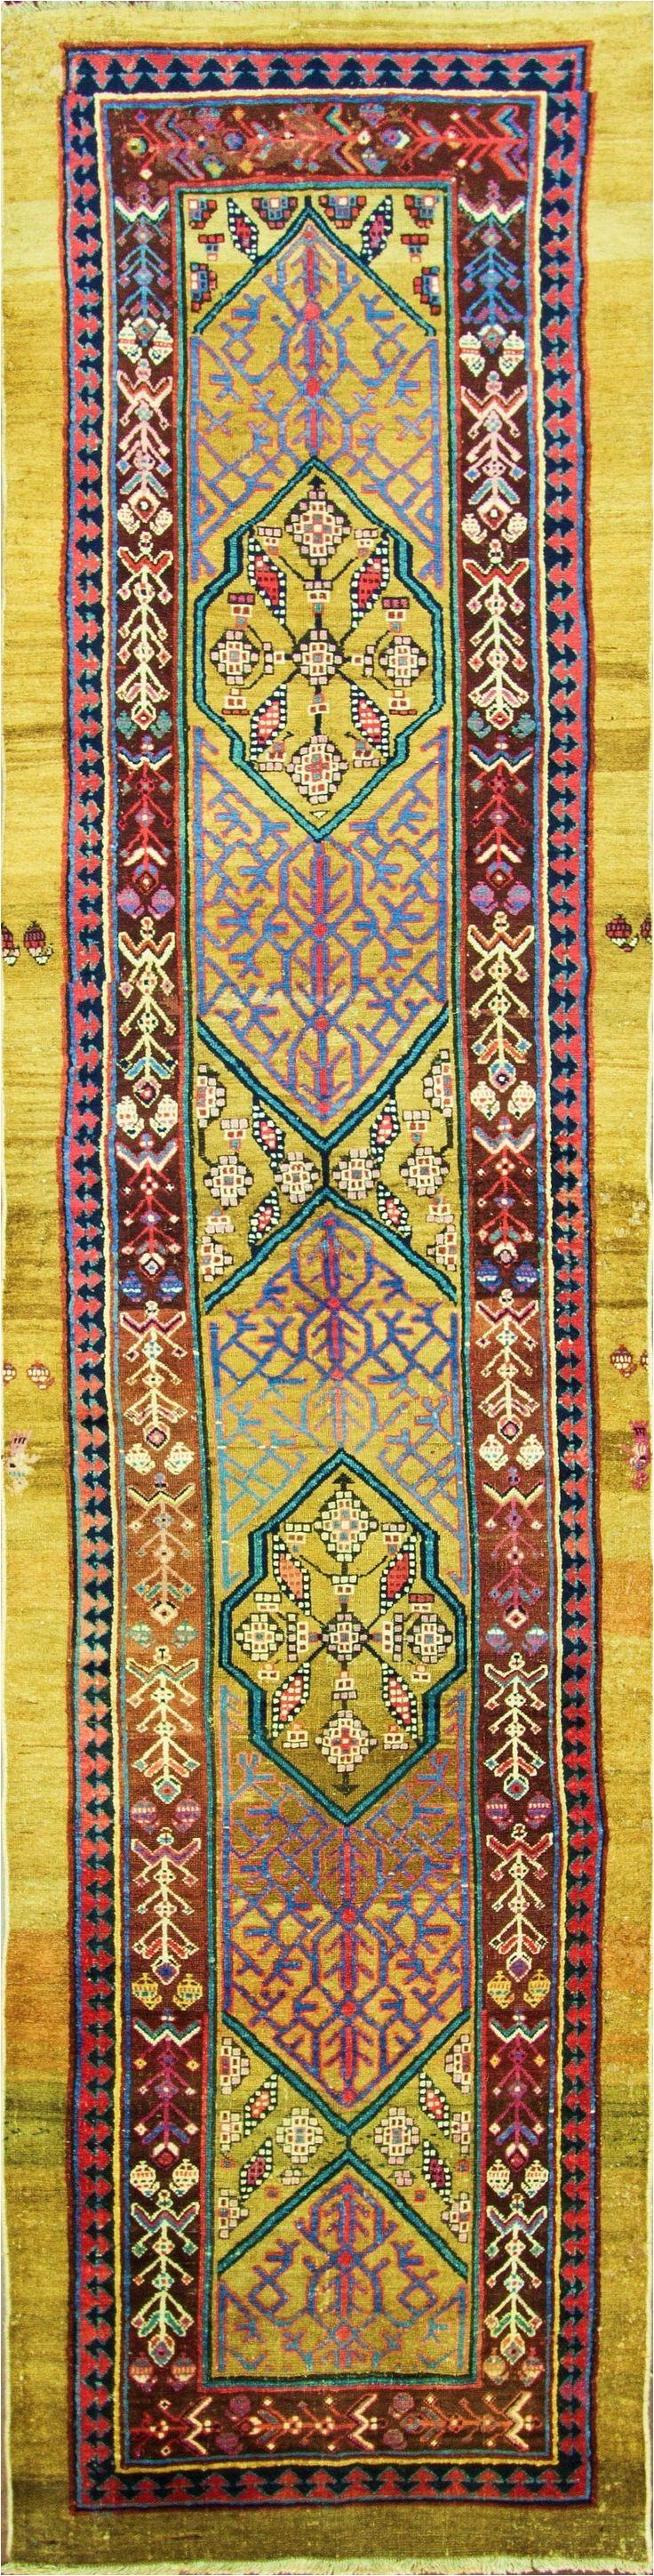 persian bakshaish runner 99cm x 432cm 1880 eli peer oriental rugs